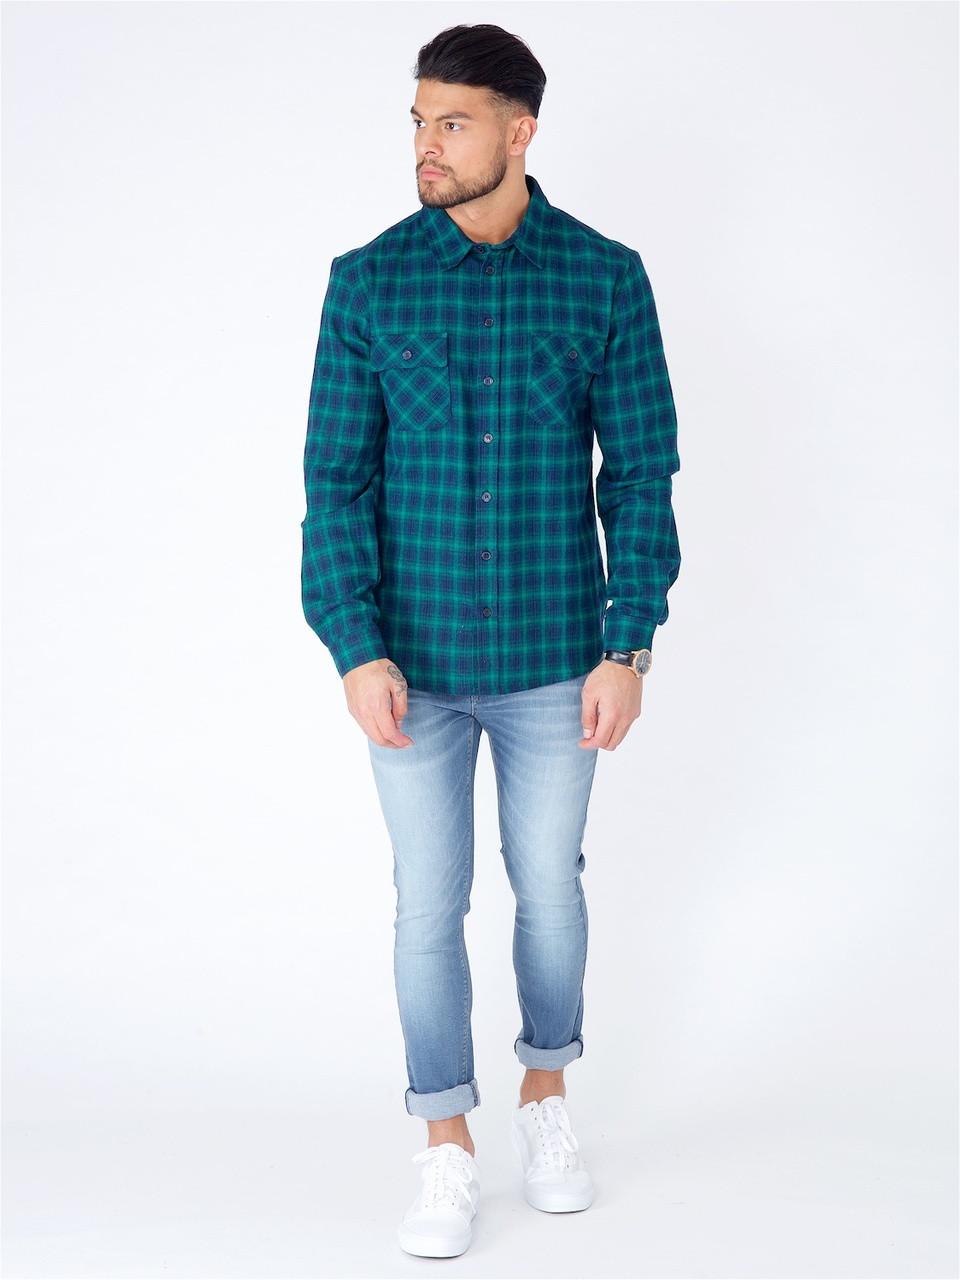 Navy Green Cotton Check Shirt